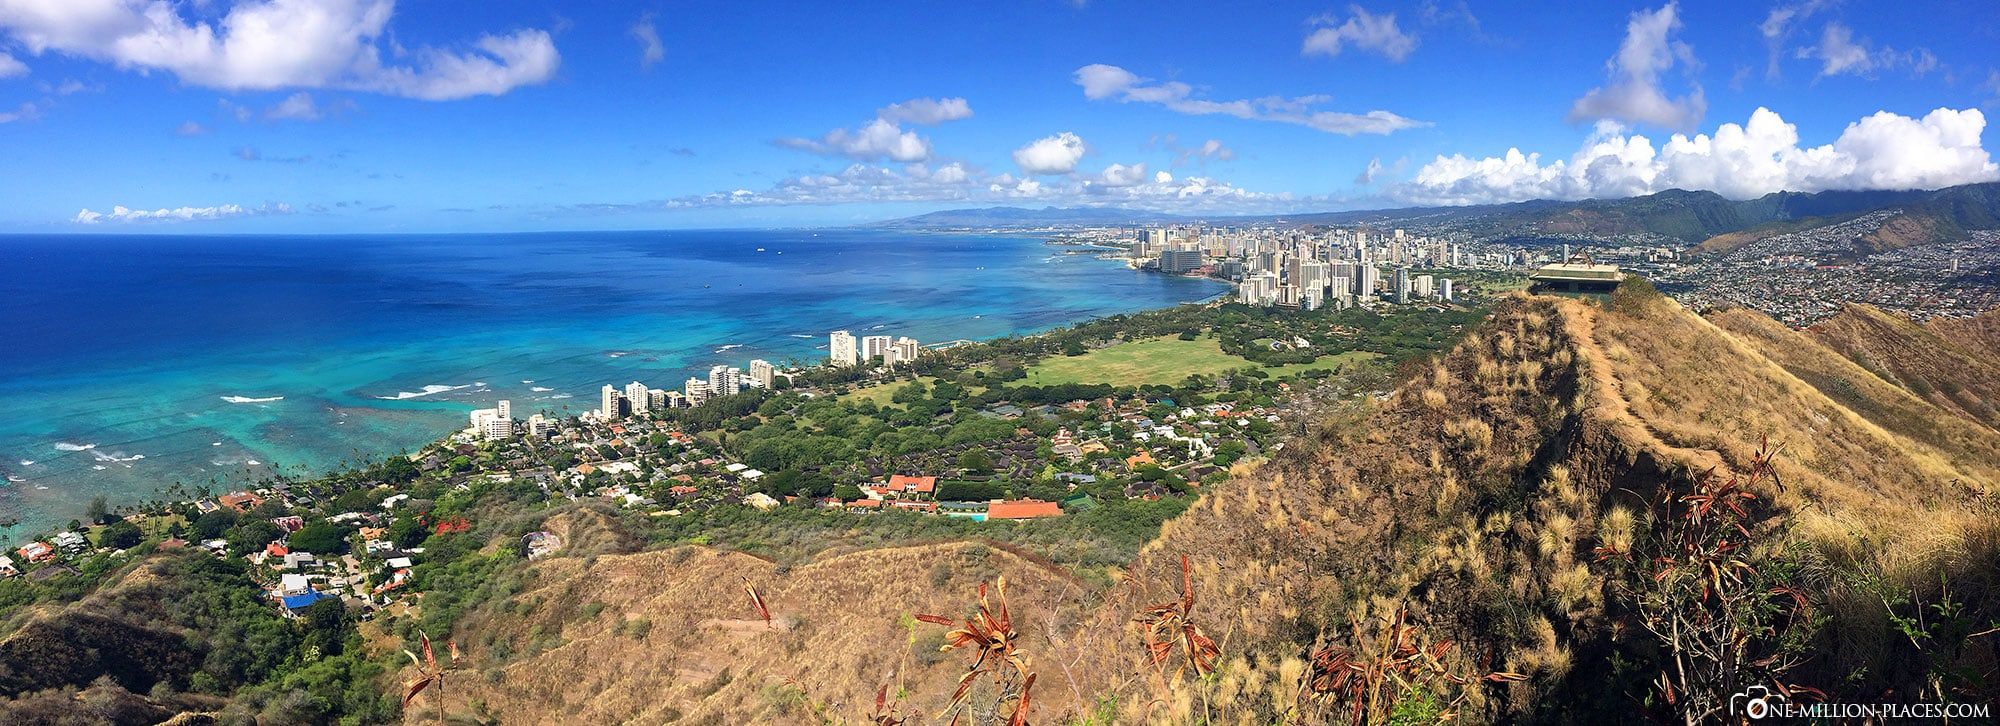 Panoramabild, Oahu, Inselrundfahrt, Auf eigene Faust, Sehenswürdigkeiten, Hawaii, USA, Reisebericht